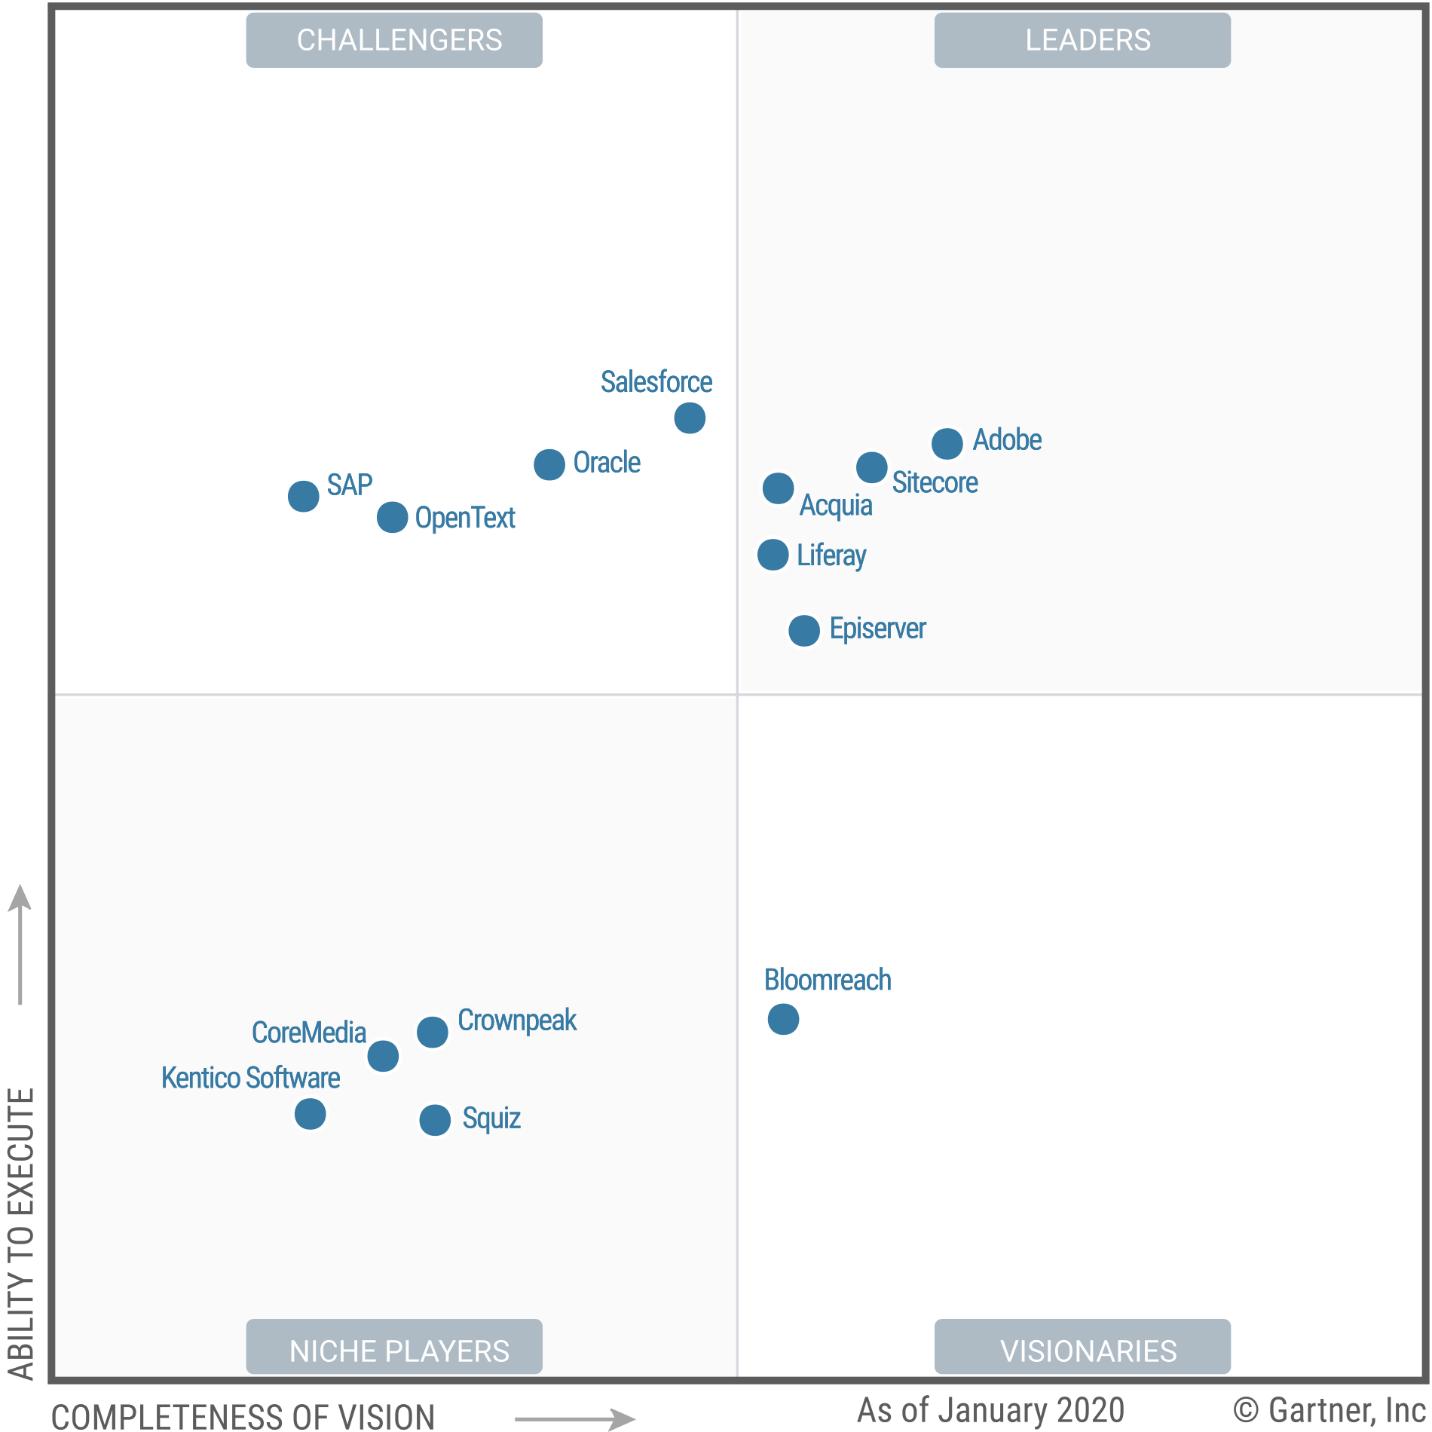 2020 Gartner magic quadrant for digital experience platforms